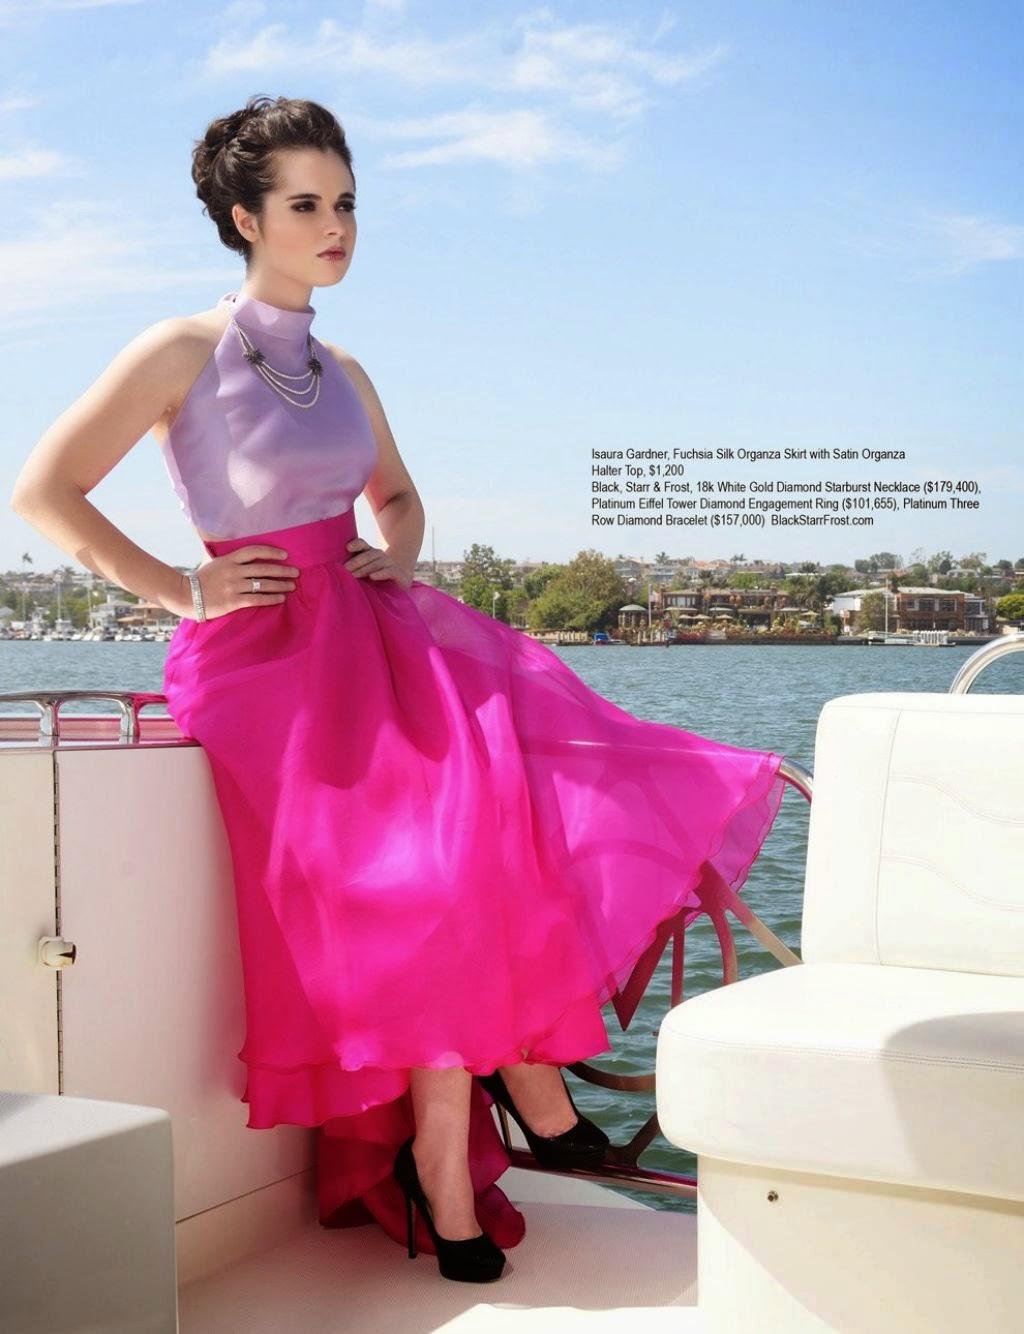 Vanessa Marano Lovely Legs In Beautiful Transparent Gowns For Regard Magazine June 2014